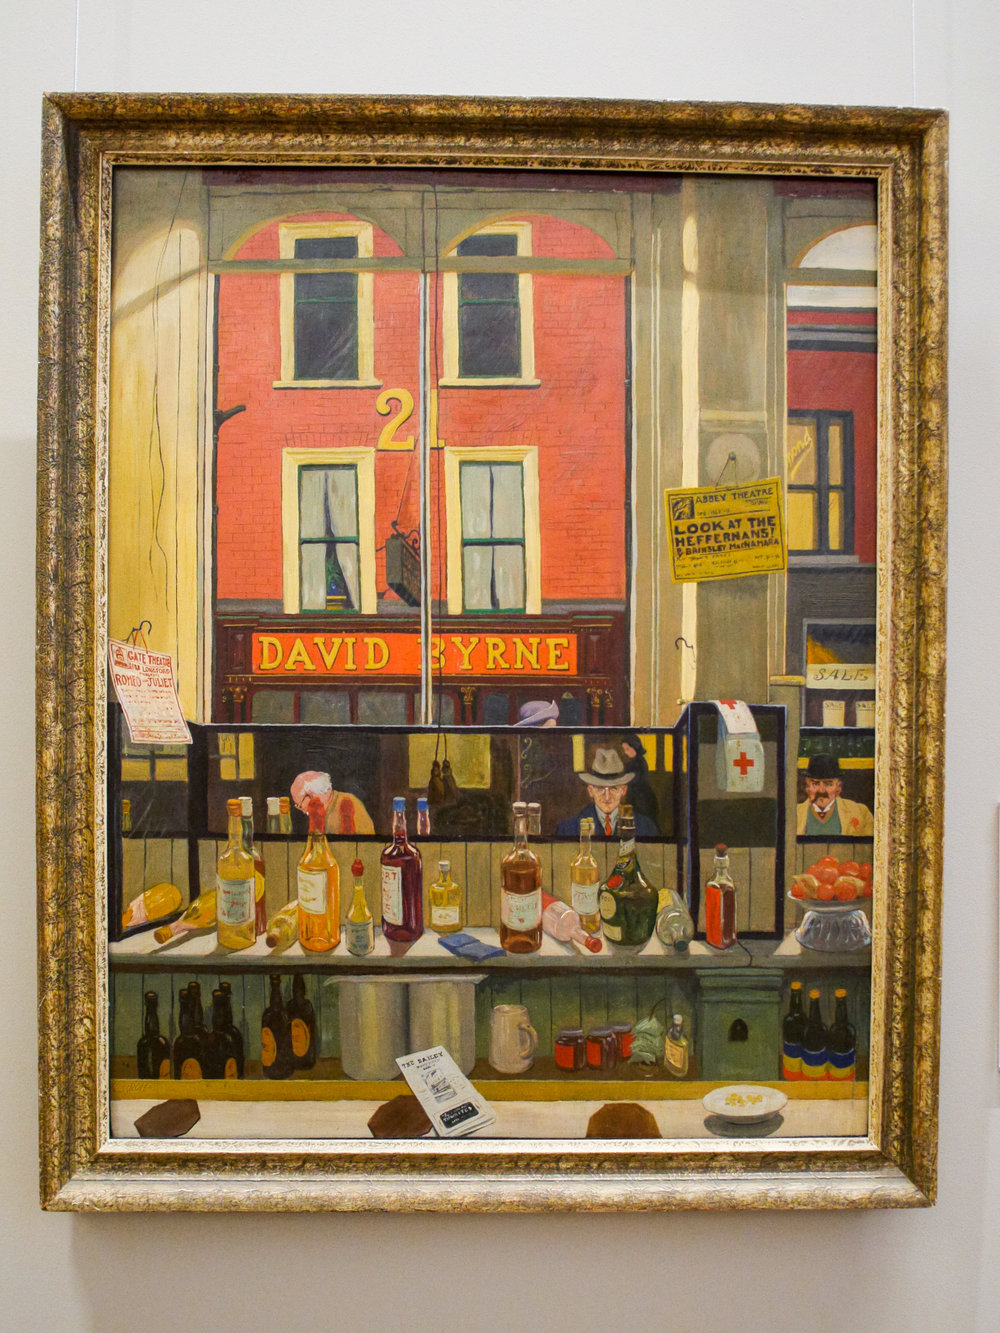 Davy Byrne's Pub, Duke Street, From The Bailey, Dublin (1941) by Harry Kernoff.